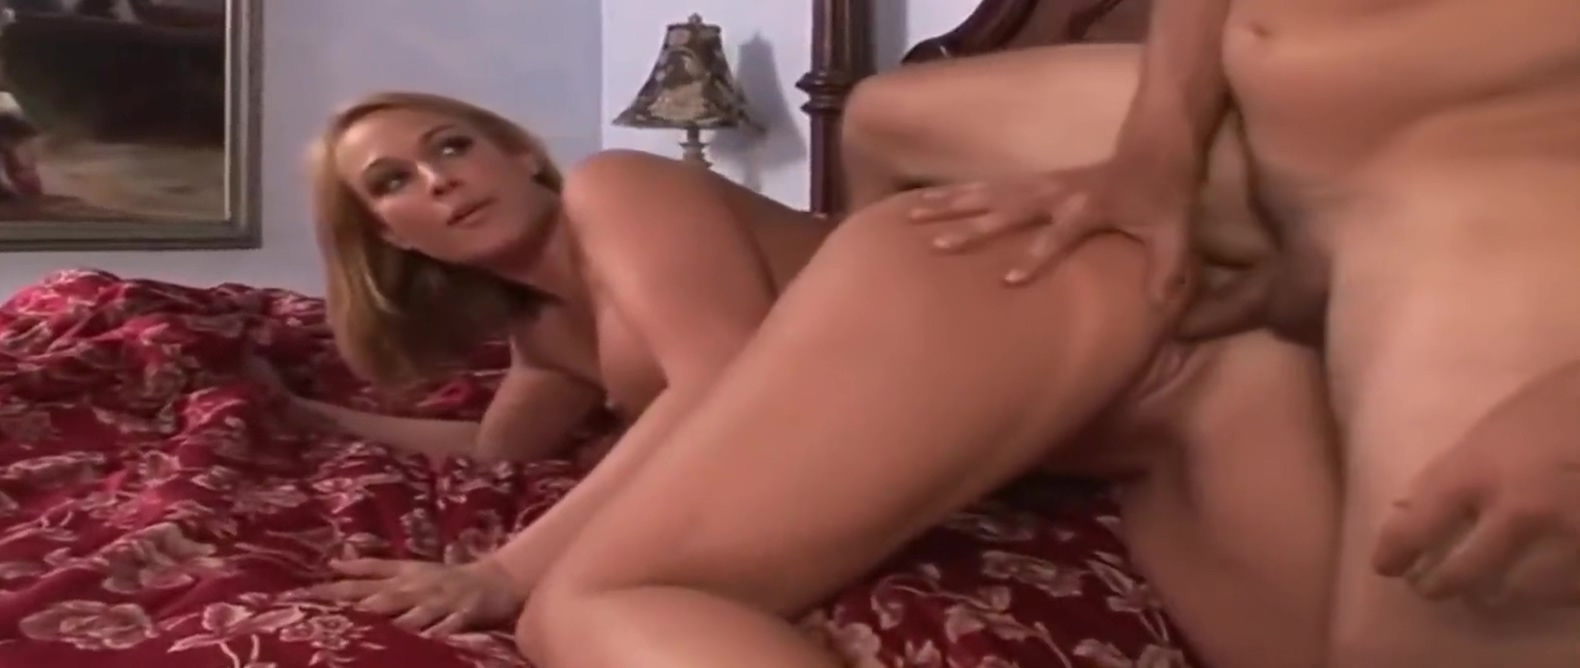 Mellanie Monroe jk1690 dress playing sexy up